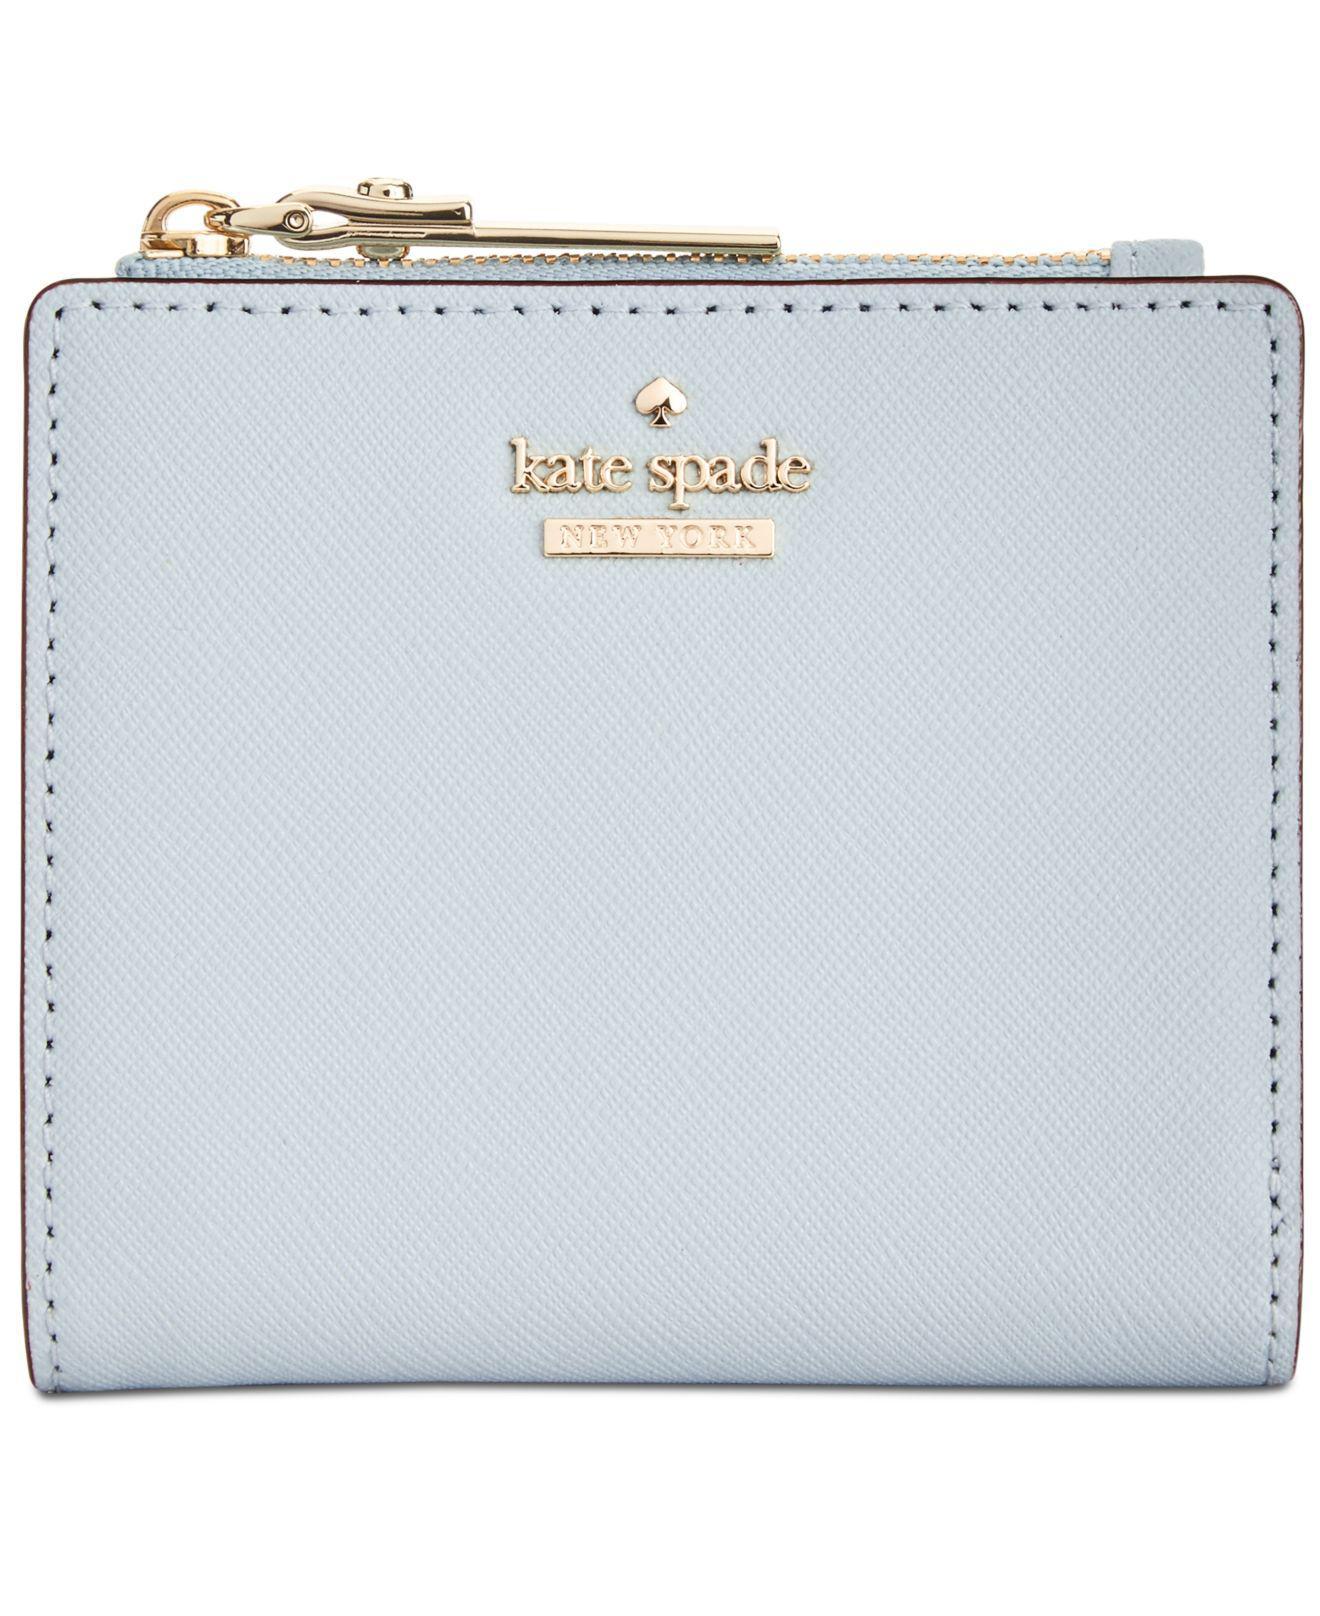 ... kate spade handbags macys handbag collections ...